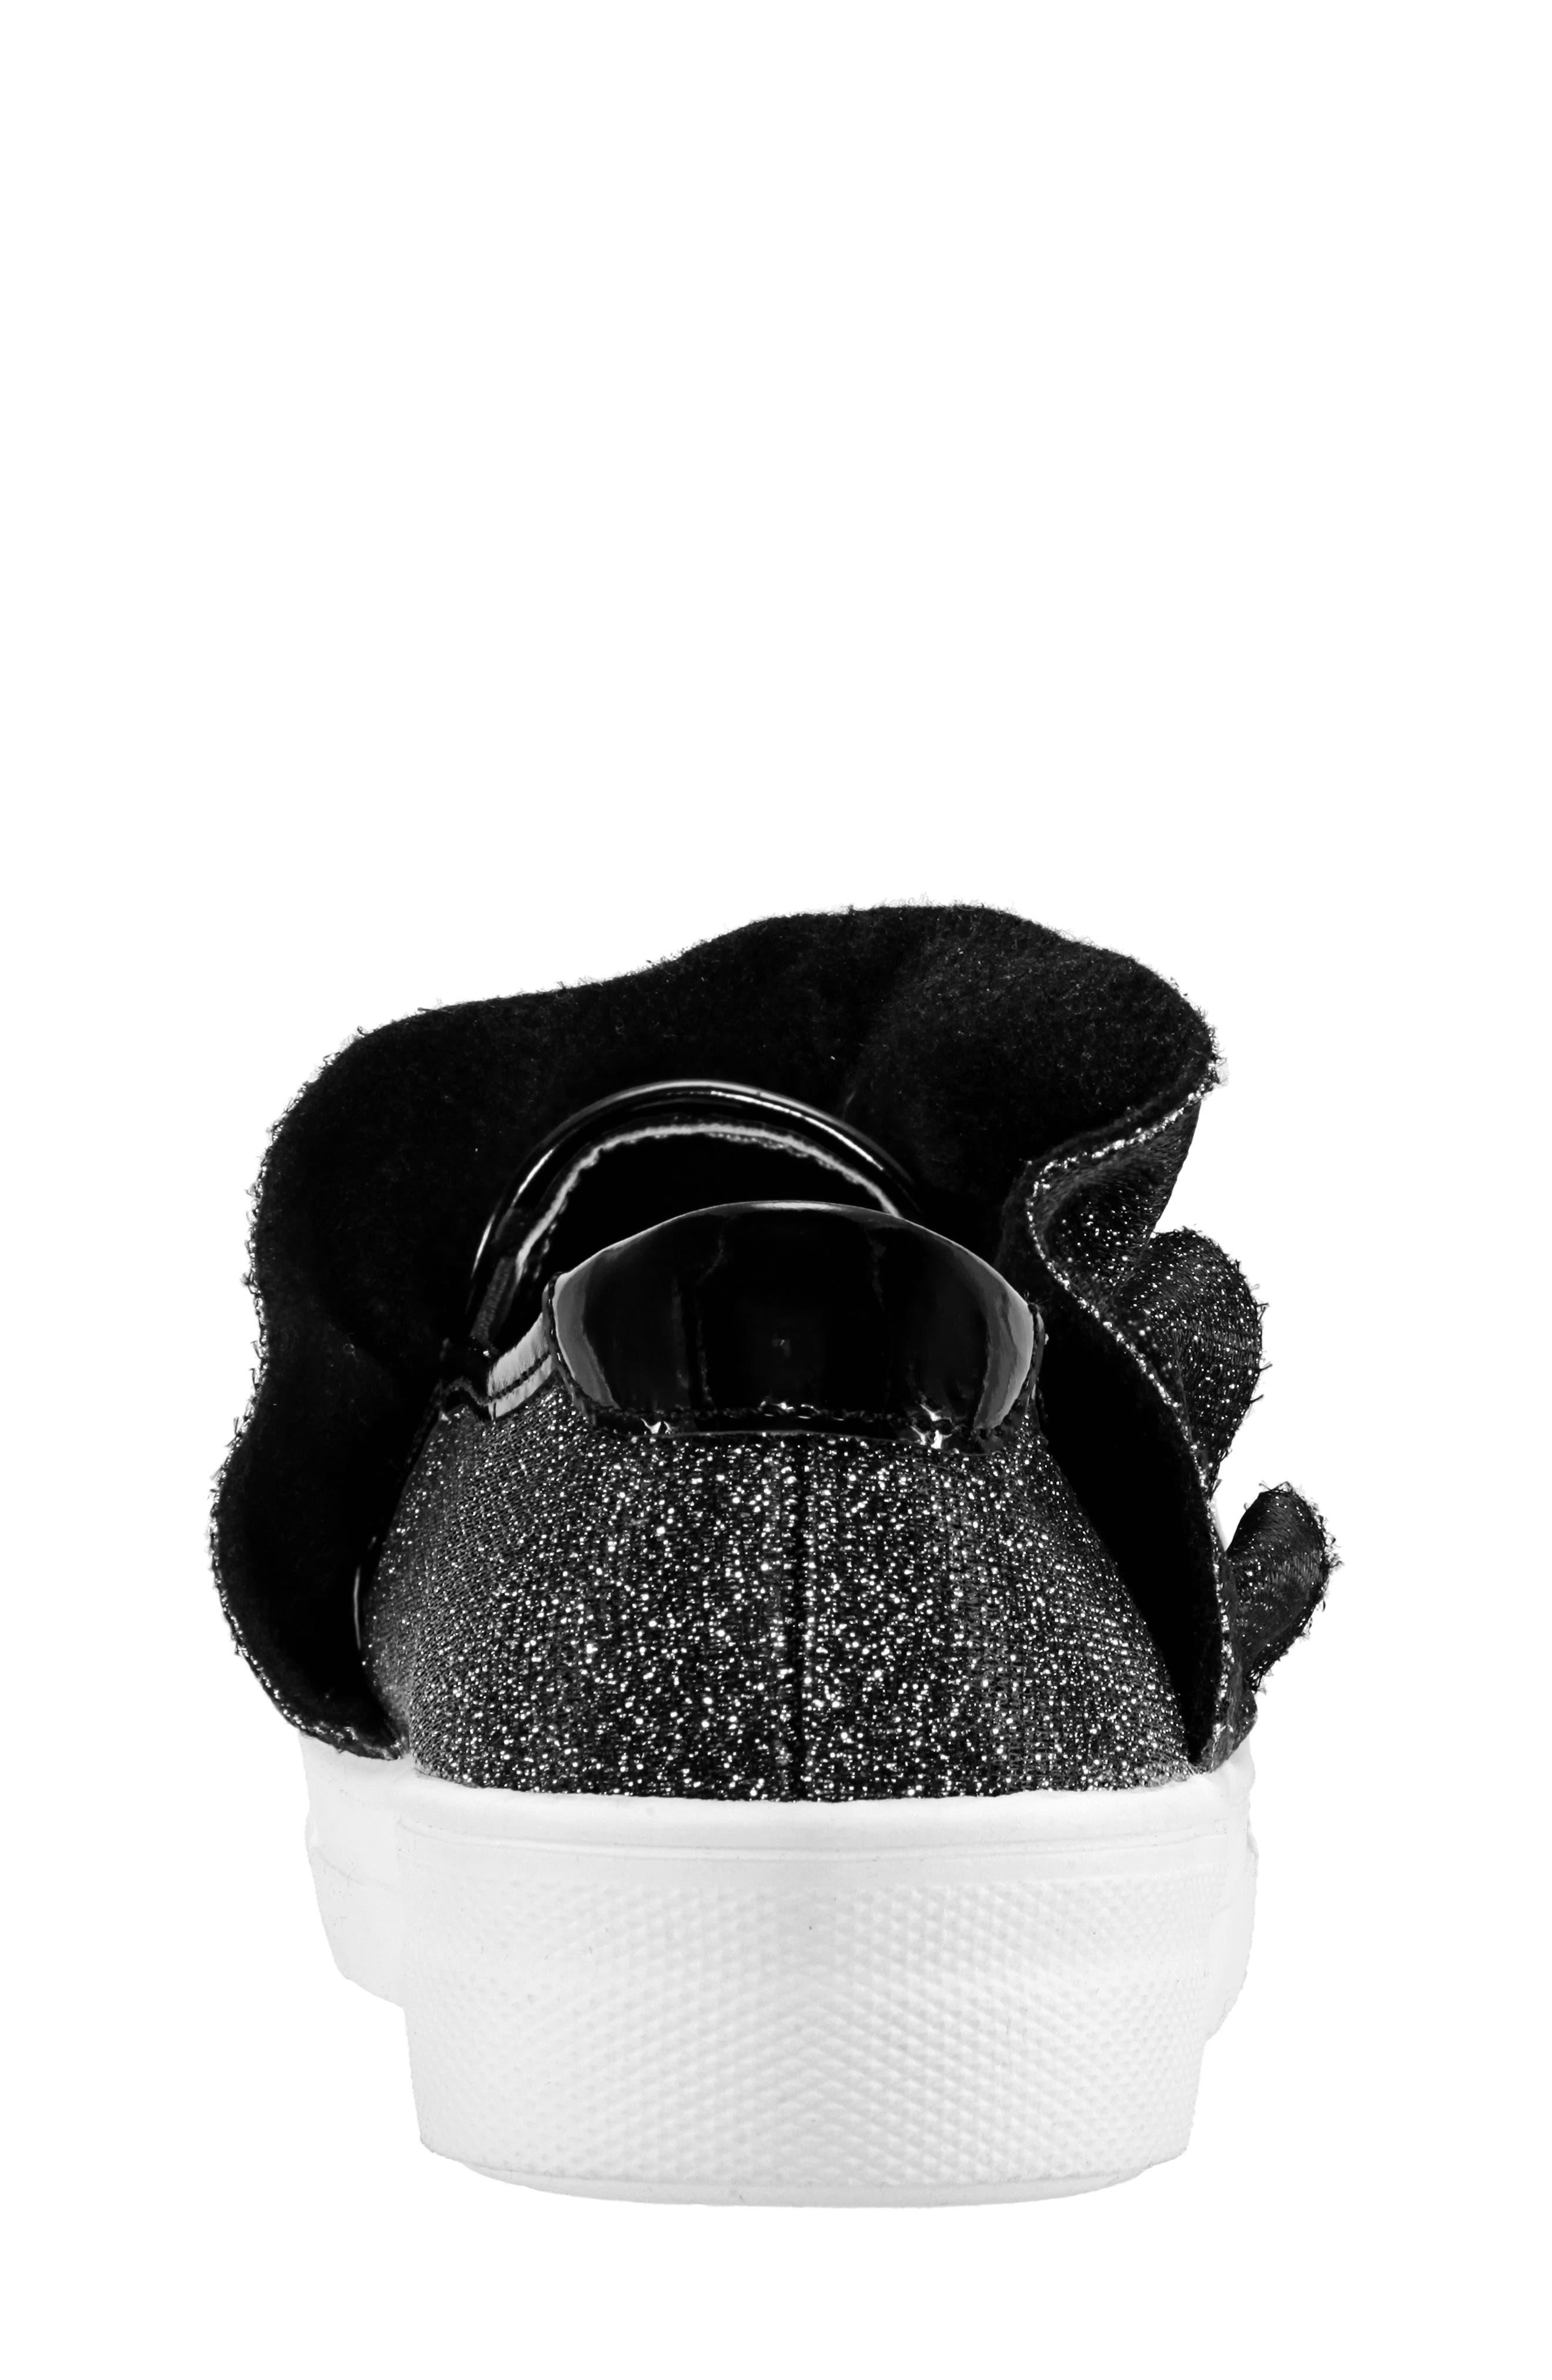 Ivani Slip-On Sneaker,                             Alternate thumbnail 7, color,                             BLACK SPARKLE FABRIC